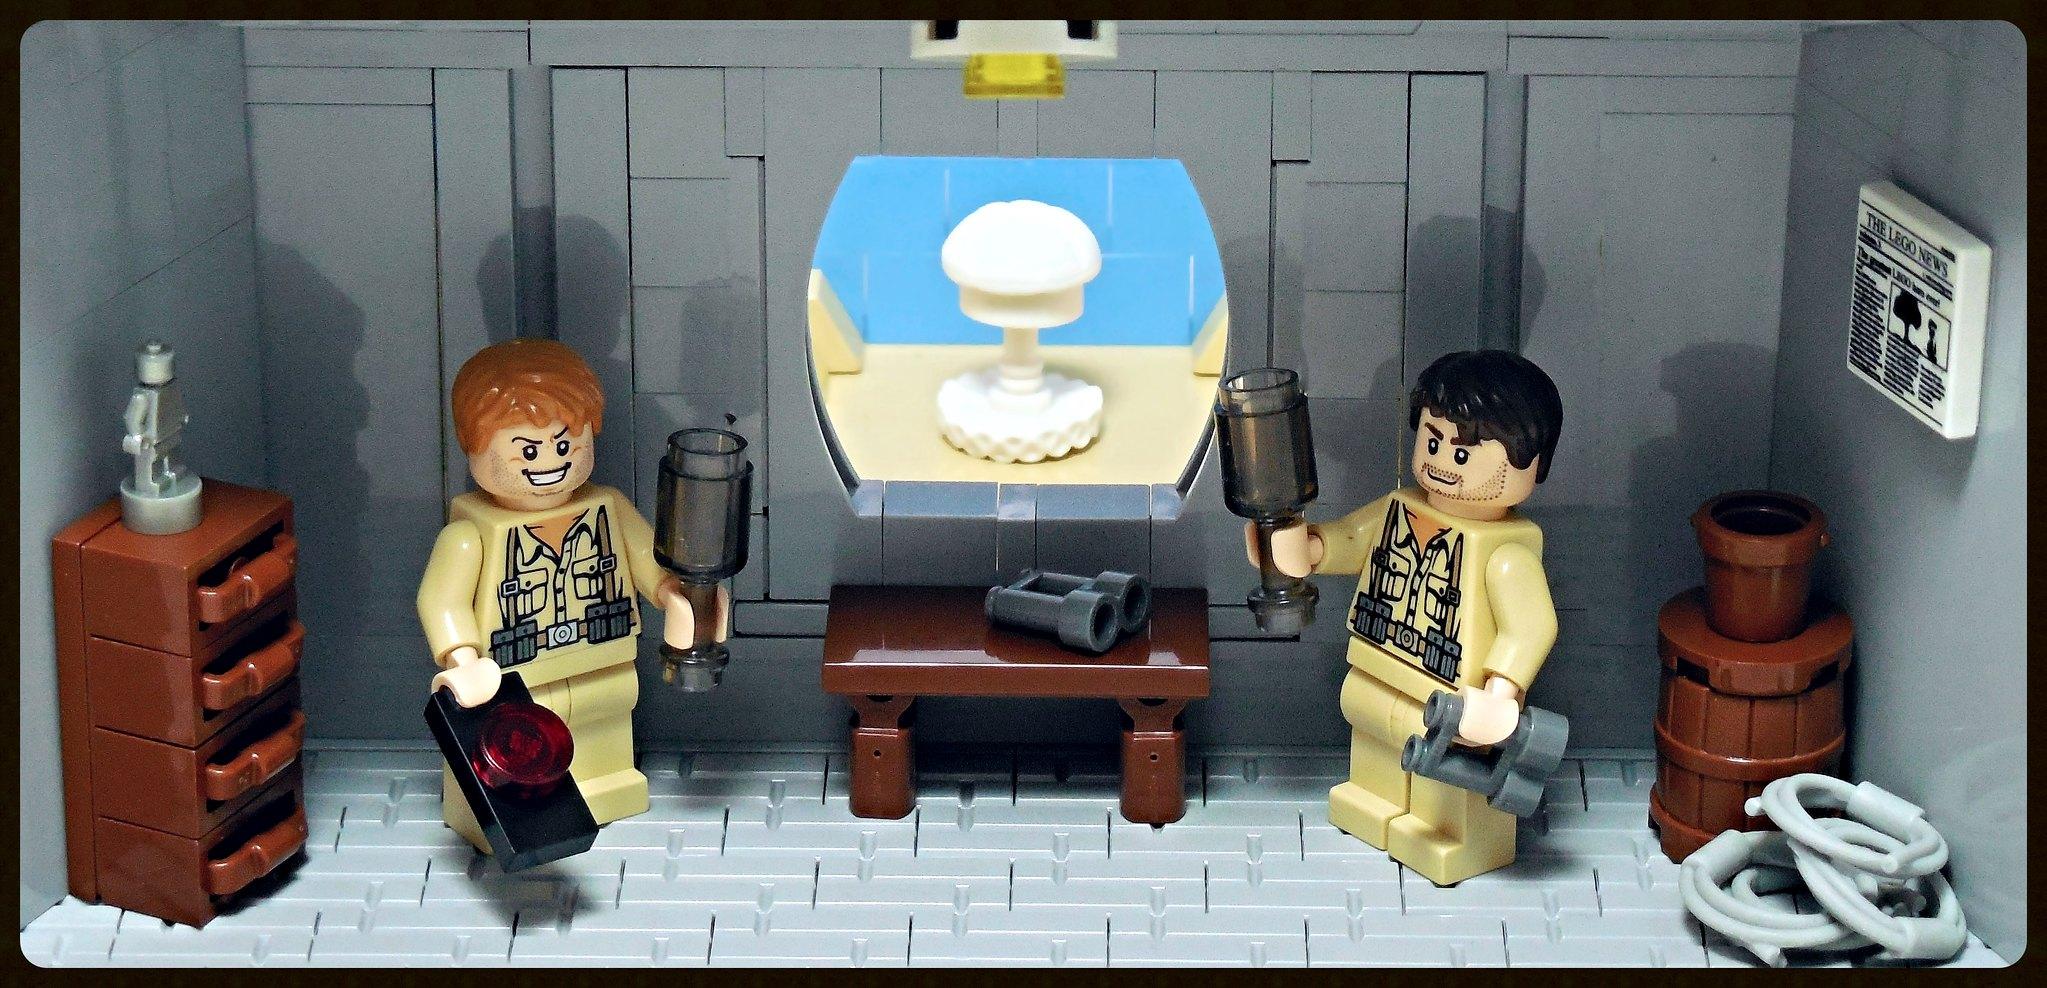 LEGO® MOC by Vitreolum: Nuclear Test